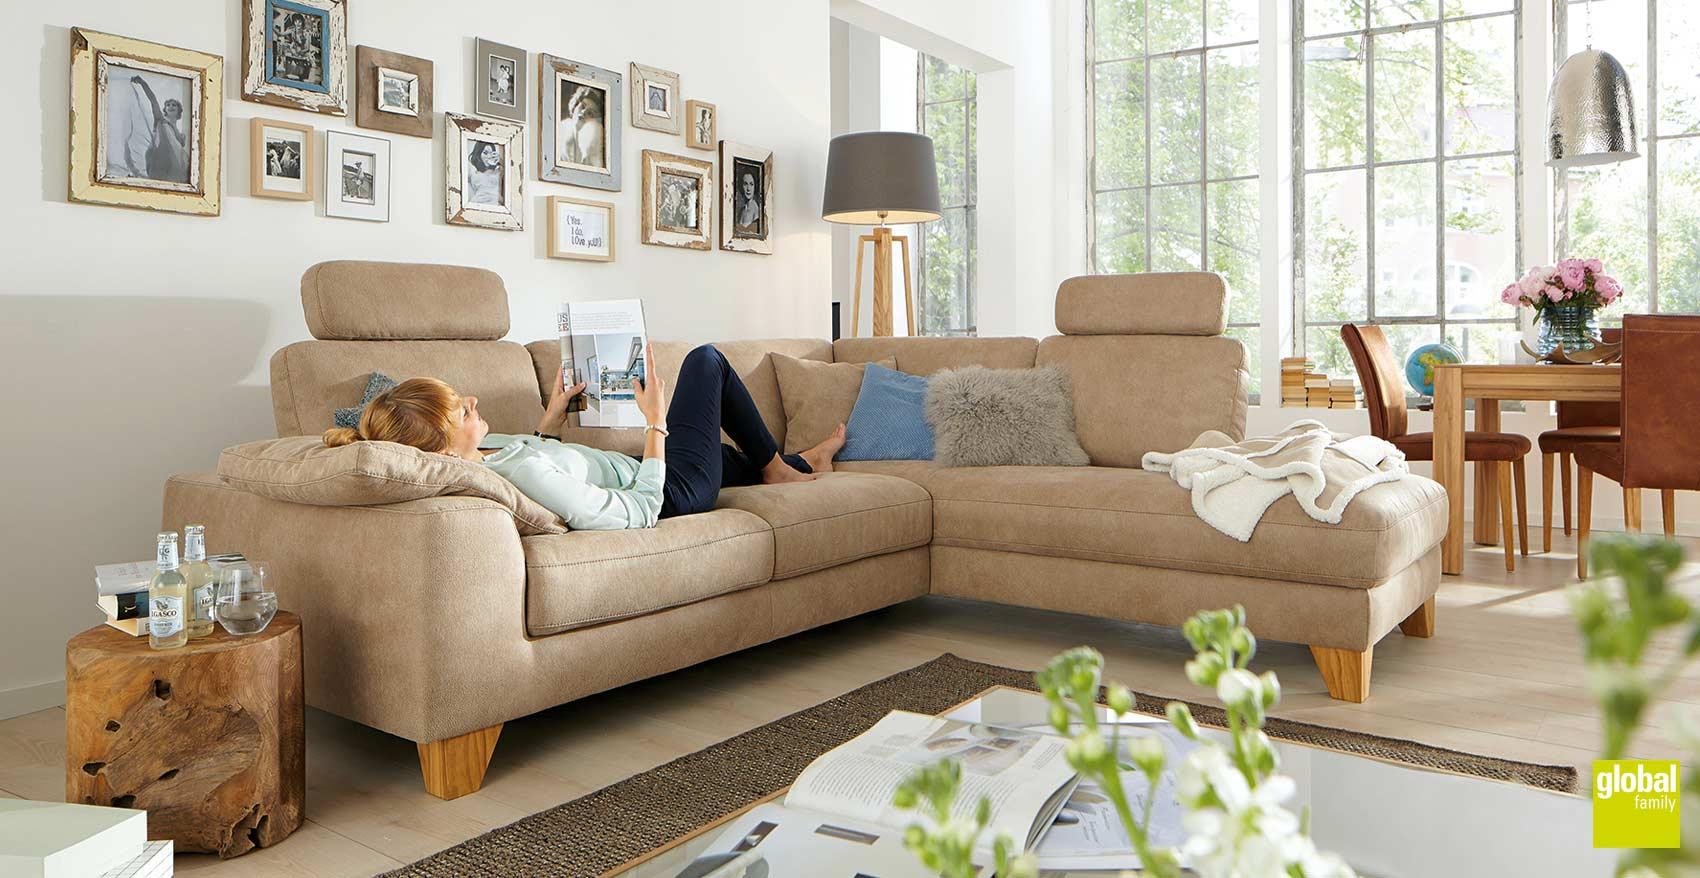 Wohnideen Lübeck nett polstermöbel lübeck ideen die schlafzimmerideen kruloei info